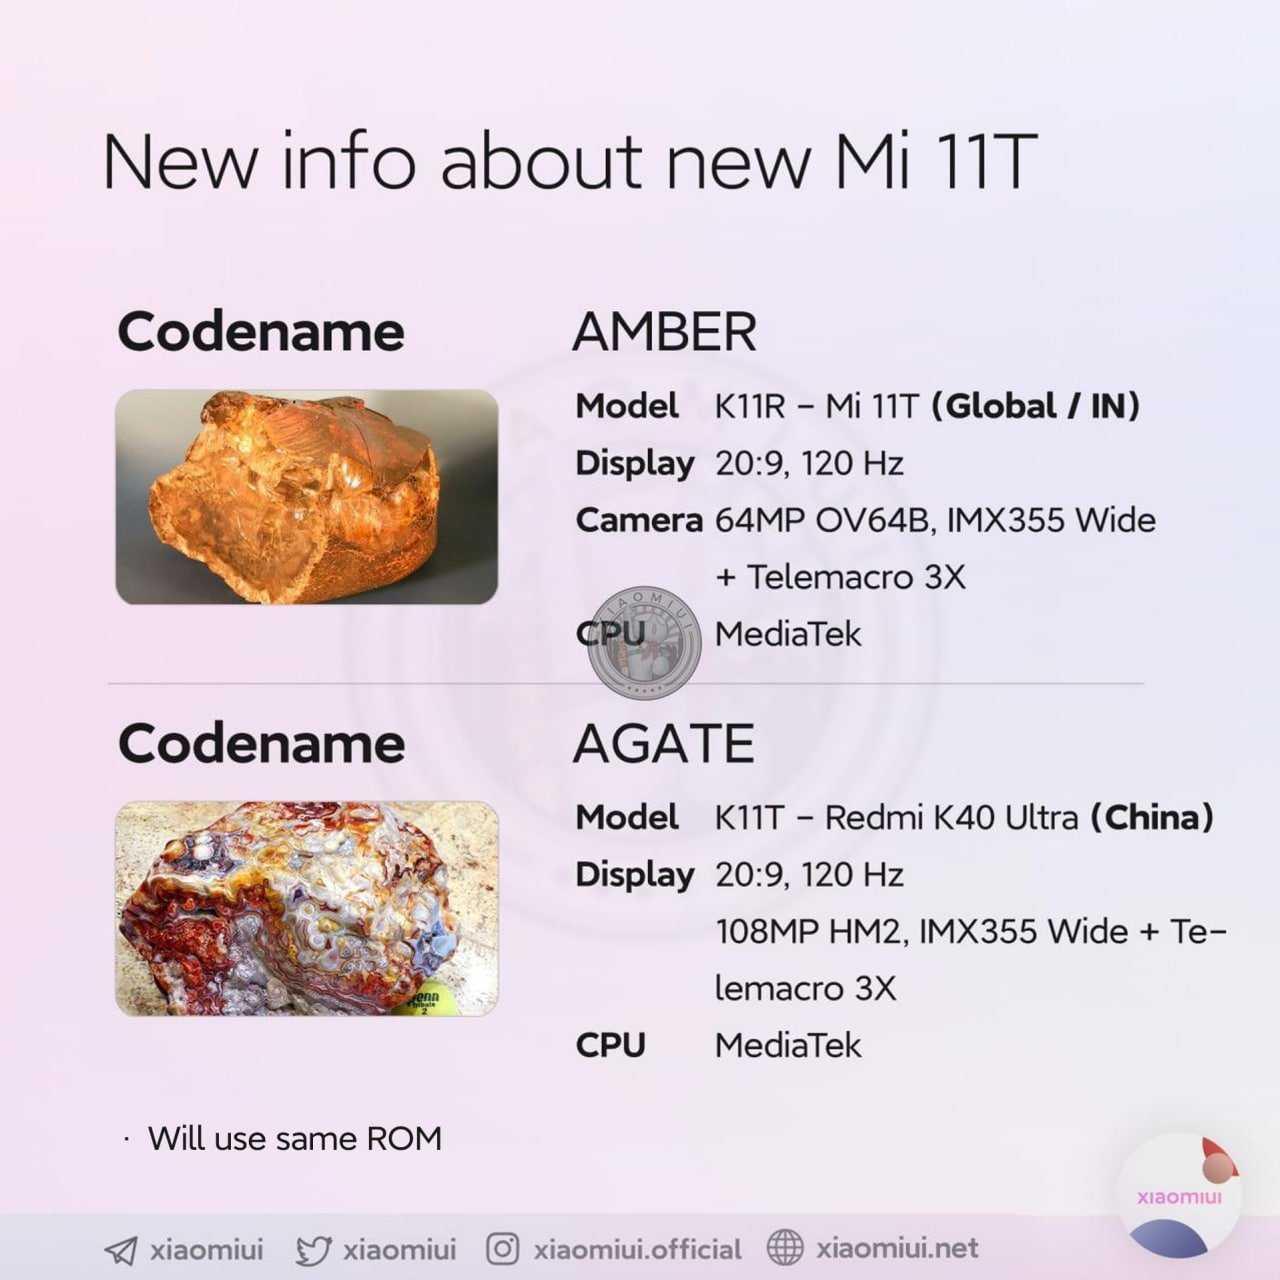 Xiaomi Mi 11T leak: new rumors are circulating on the net